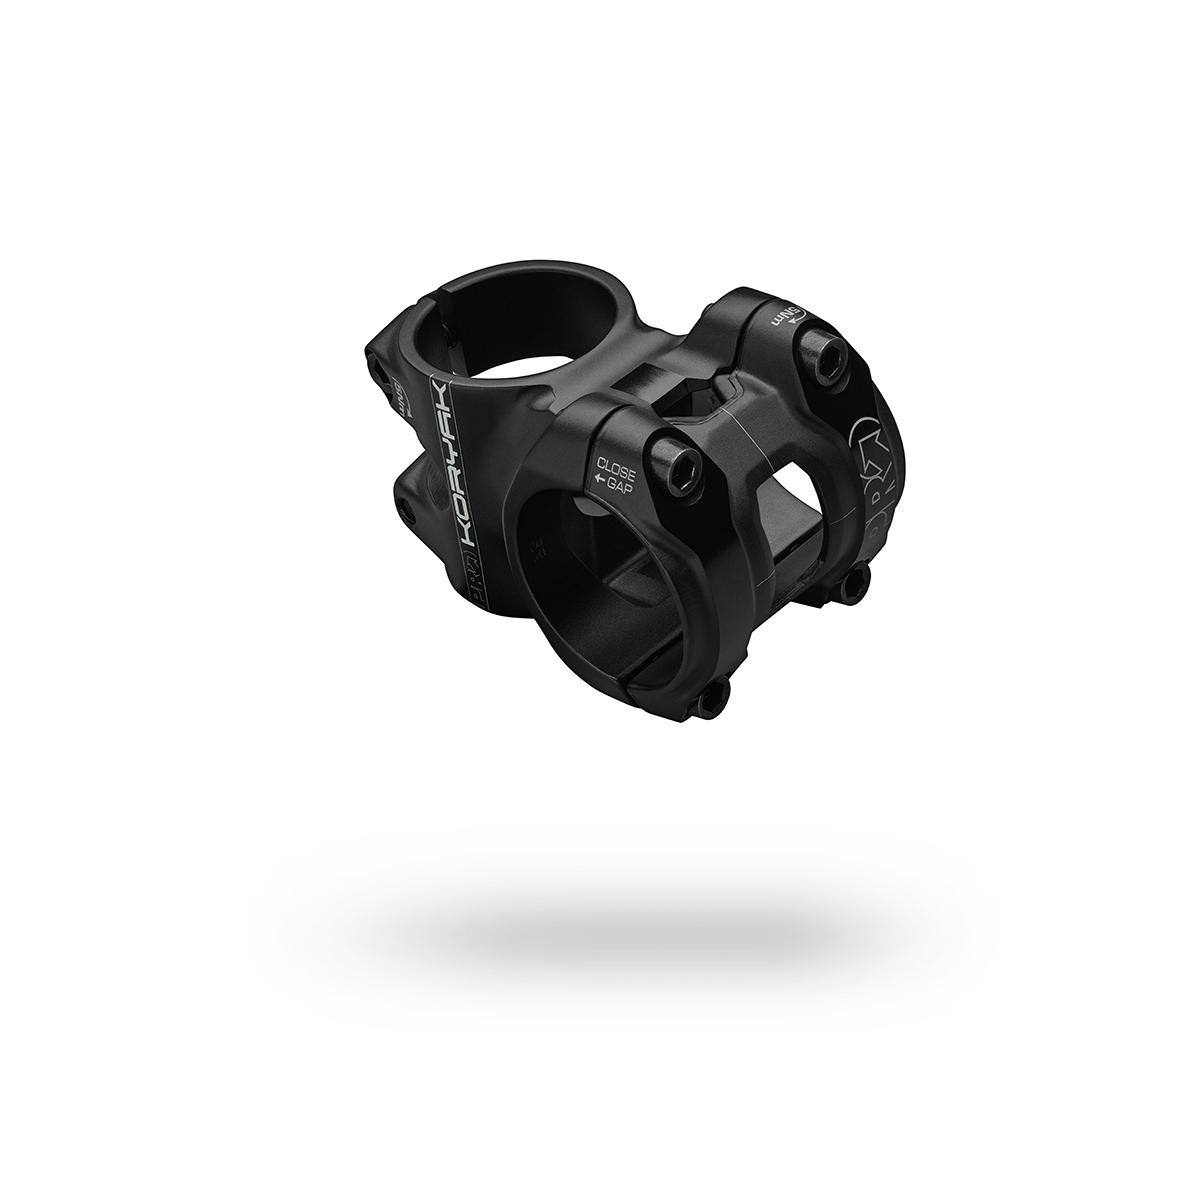 Stem Koryak 31.8mm x 60mm 0° Black